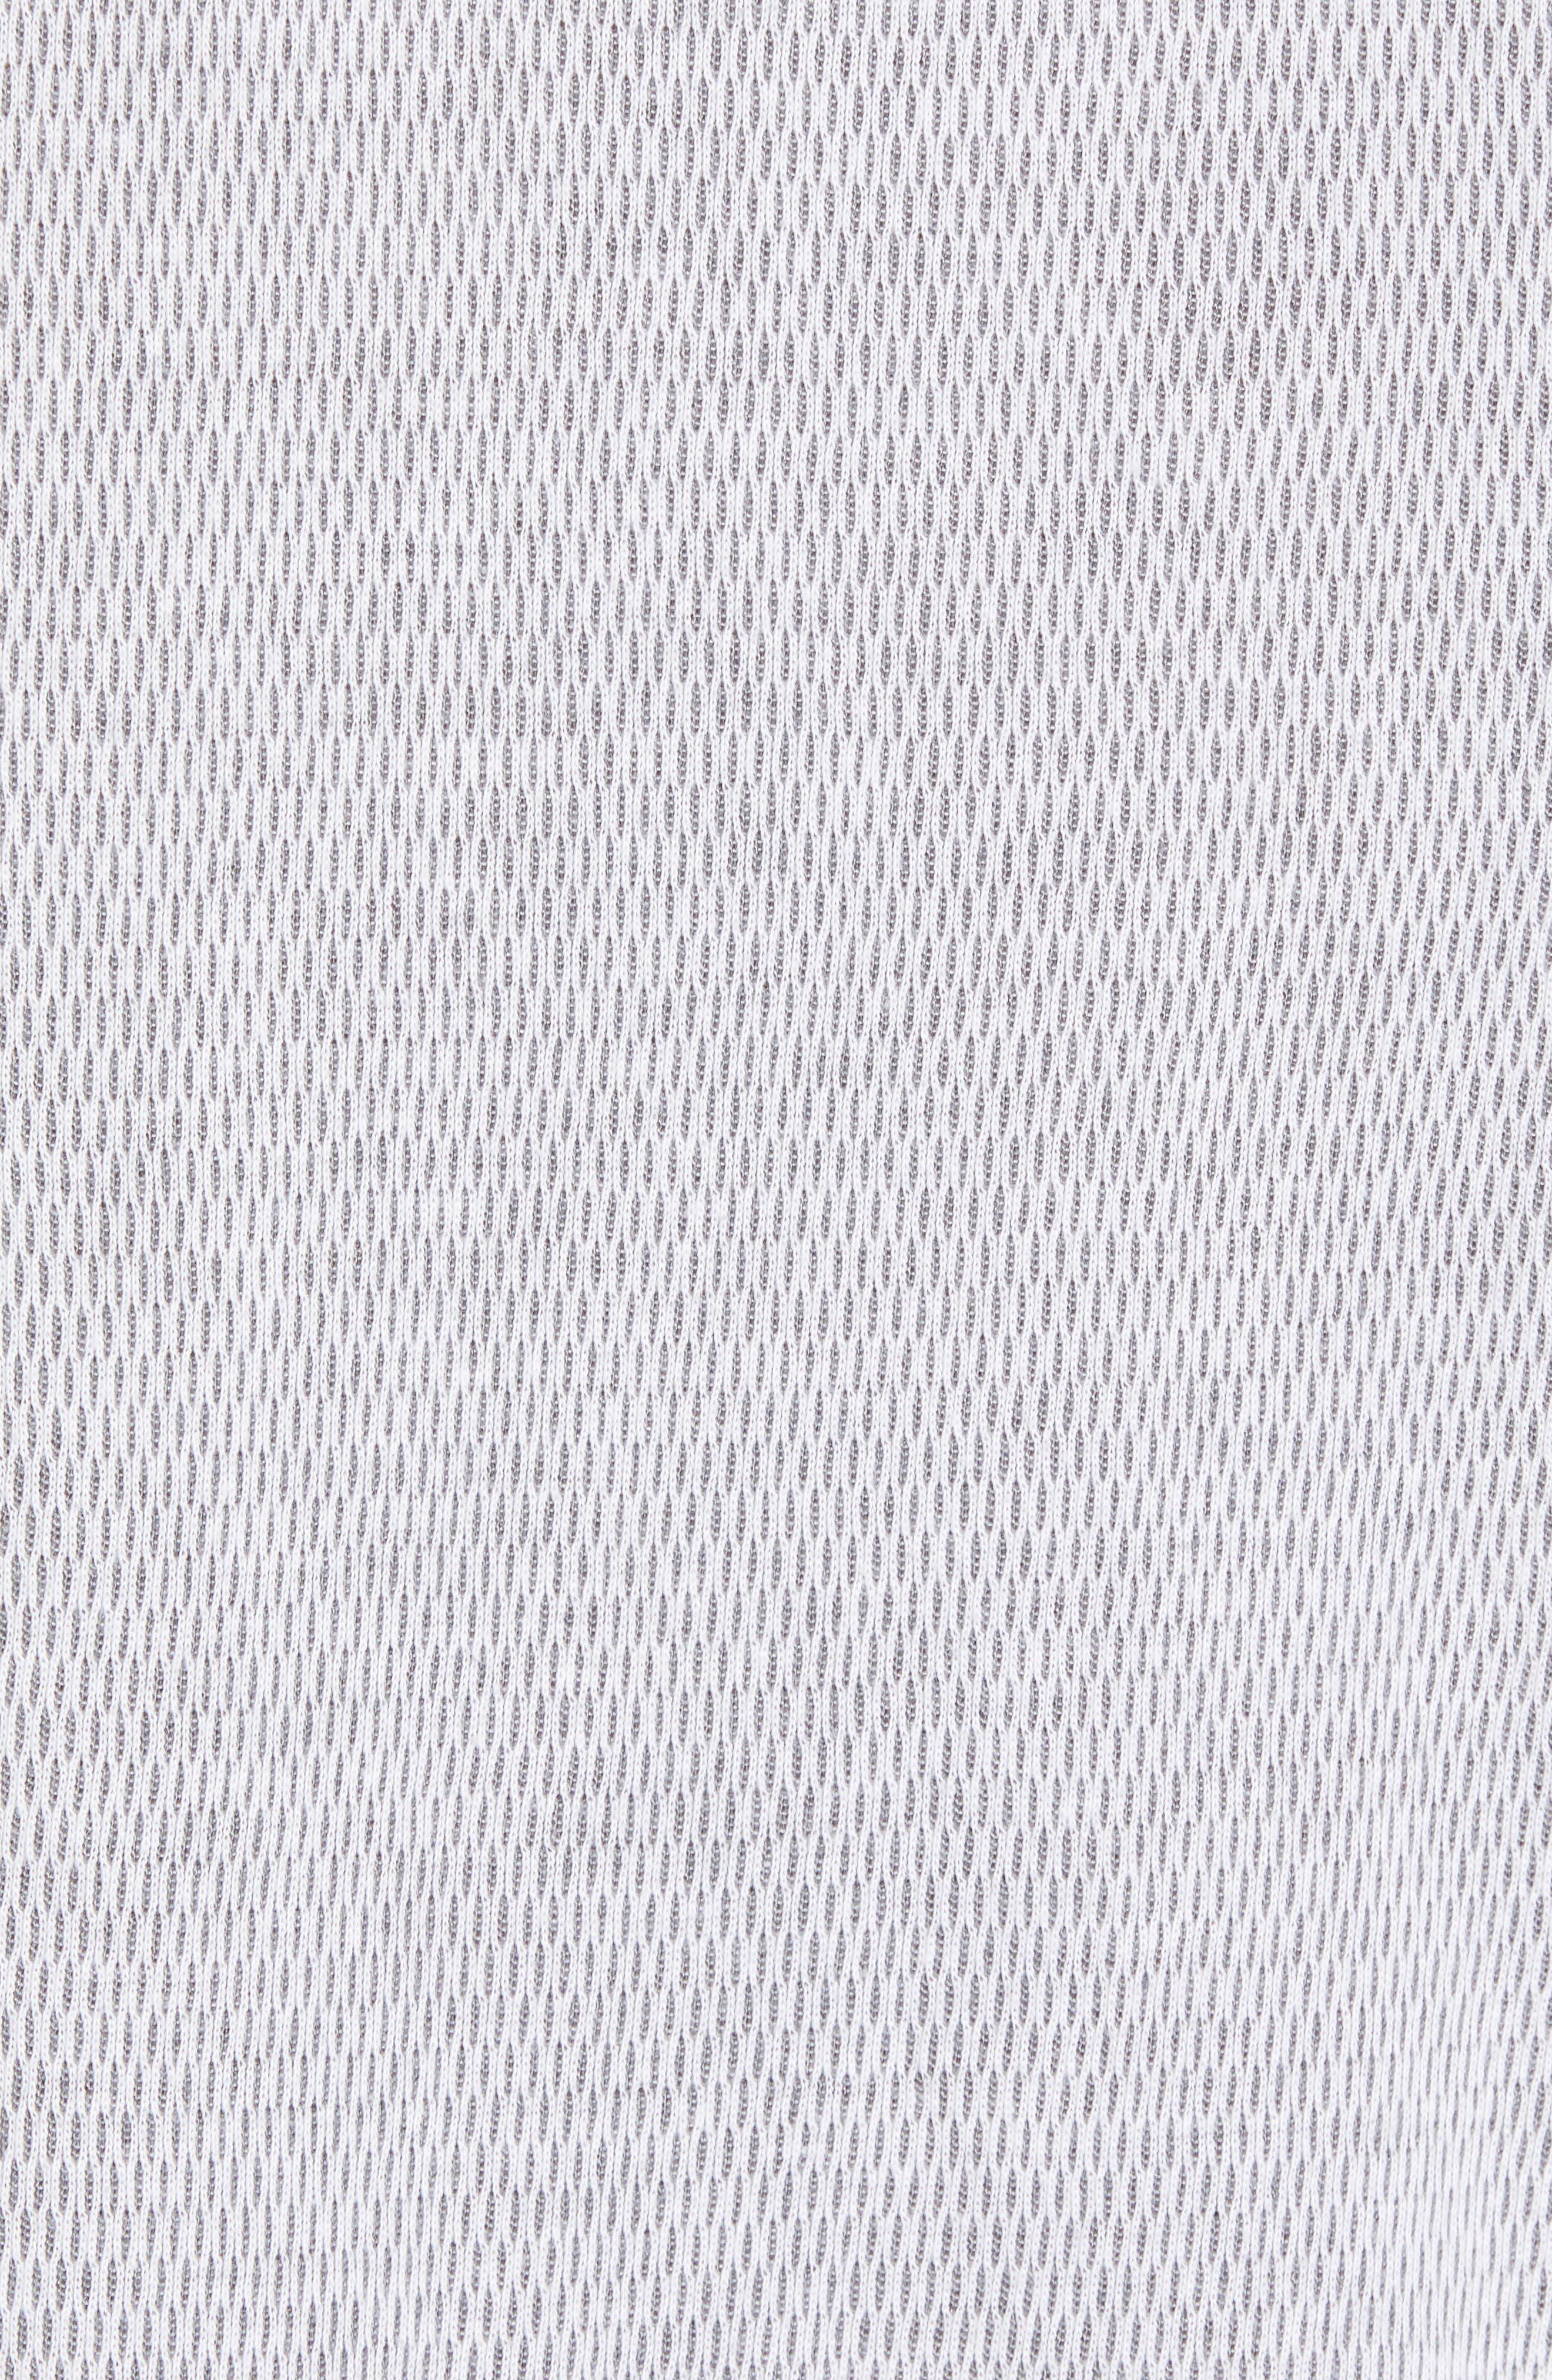 Thermal Knit Raglan Hoodie,                             Alternate thumbnail 5, color,                             GREY/ WHITE TWO TONE